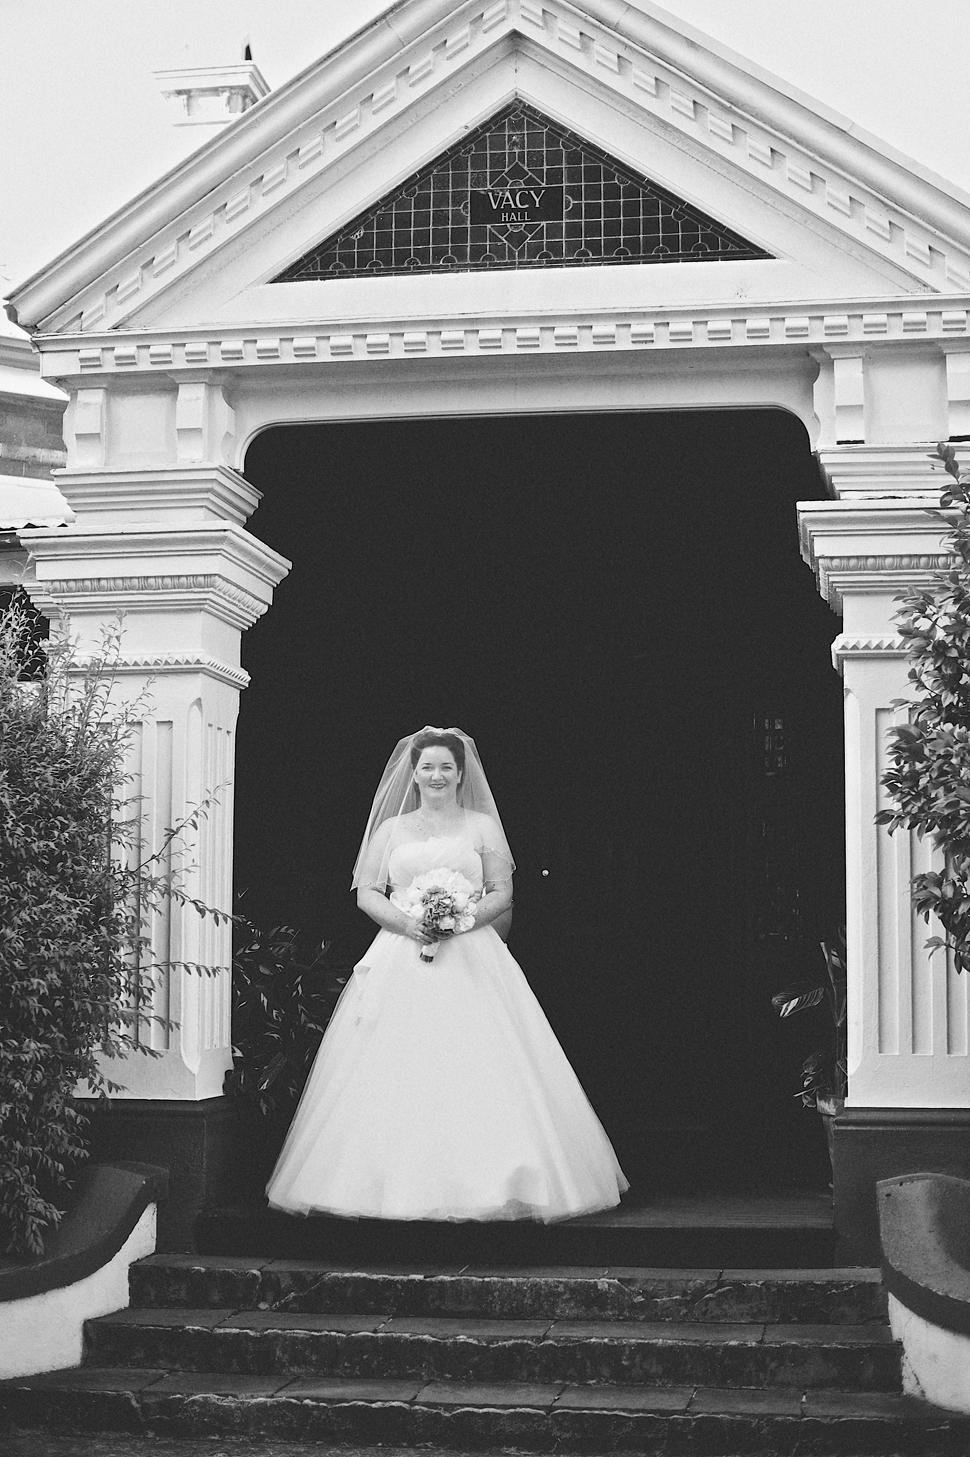 carli-andrew-vacy-hall-toowoomba-wedding-photographer026